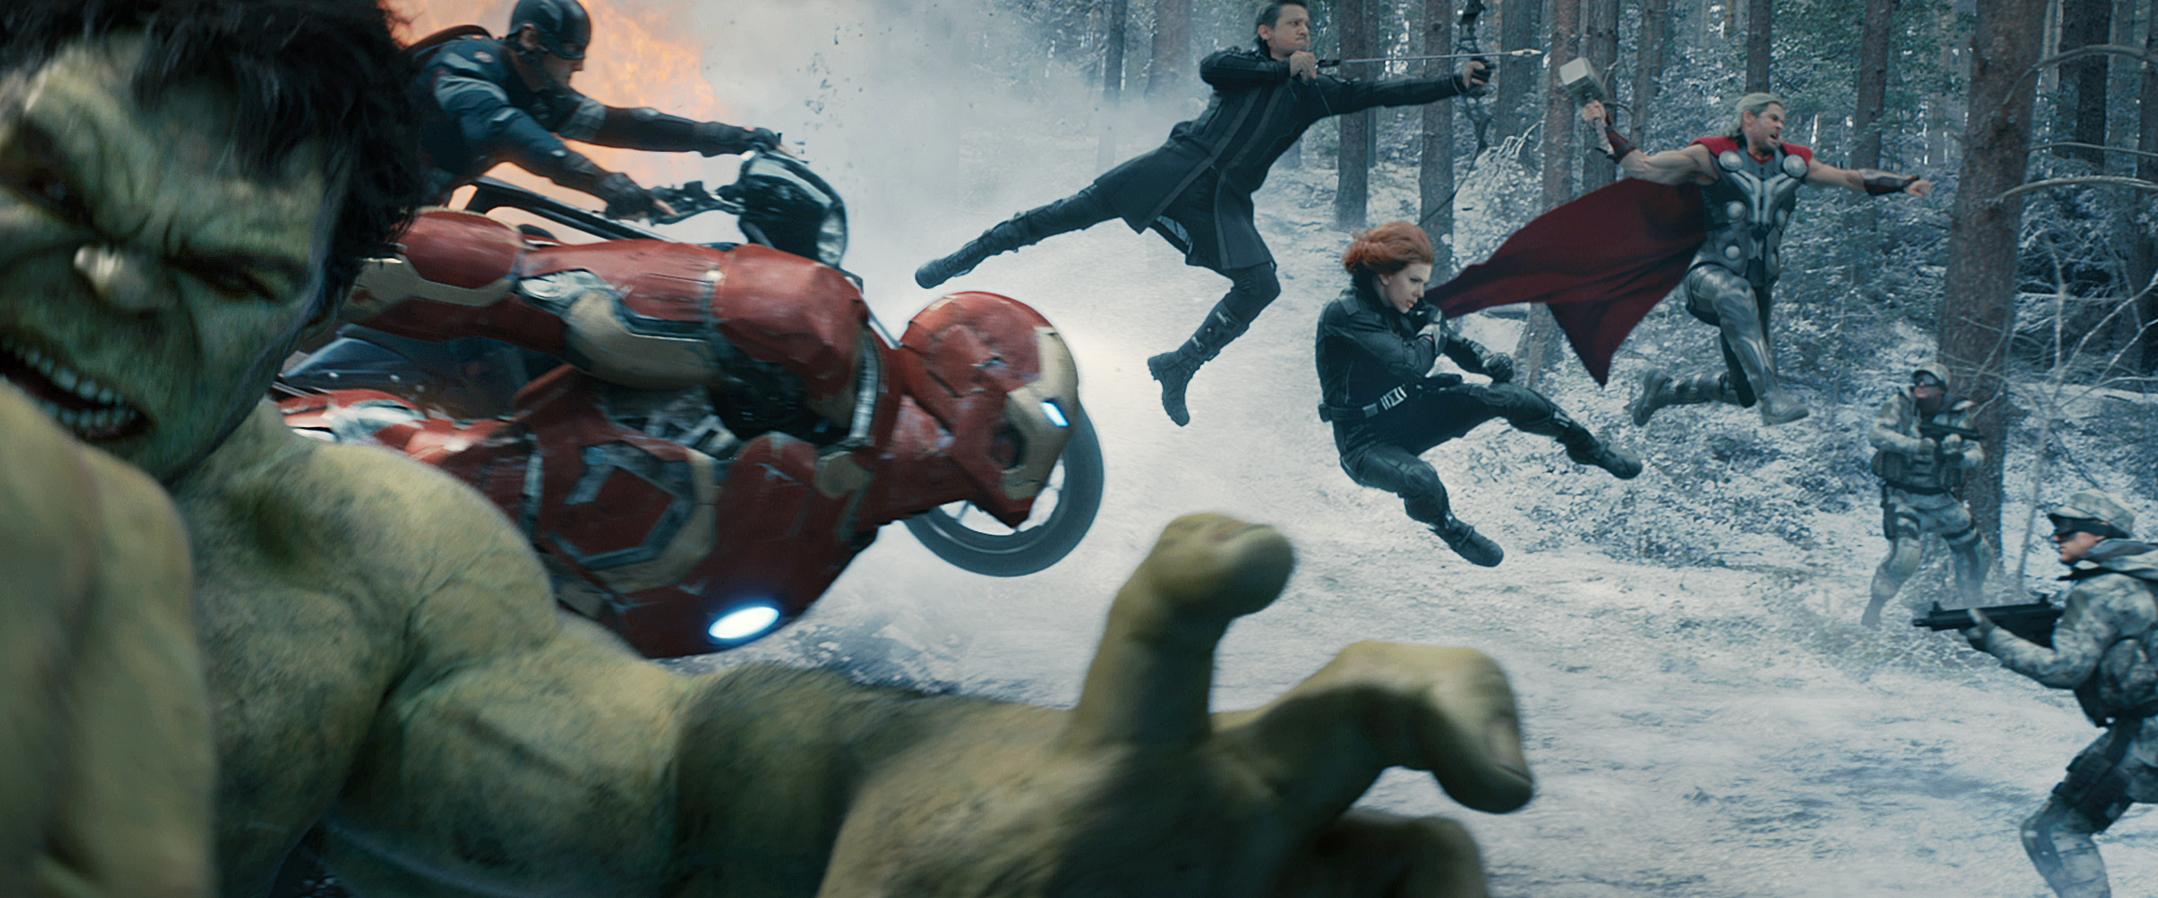 Marvel's Avengers: Age Of Ultron..L to R: Hulk (Mark Ruffalo), Captain America (Chris Evans), Iron Man (Robert Downey Jr.), Hawkeye (Jeremy Renner), Black Widow (Scarlett Johansson), and Thor (Chris Hemsworth)..Ph: Film Frame..©Marvel 2015